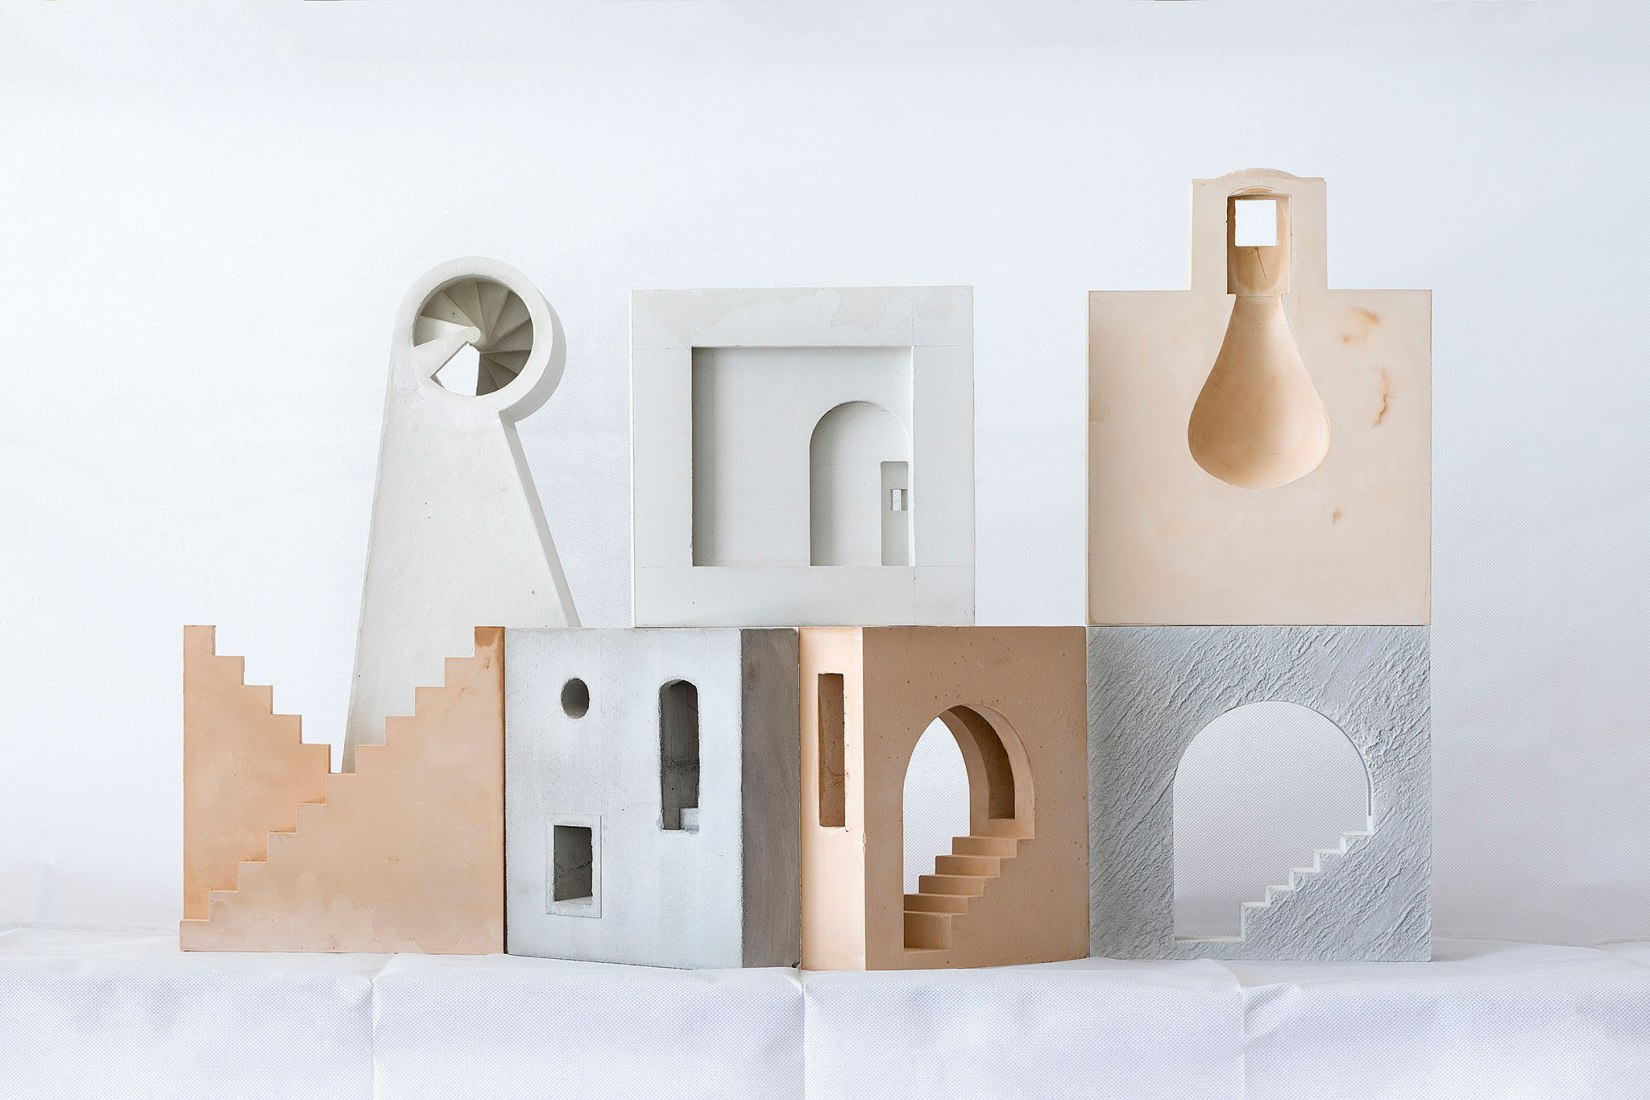 Architecture Fragments by Marià Castelló. Photograph by Marià Castelló